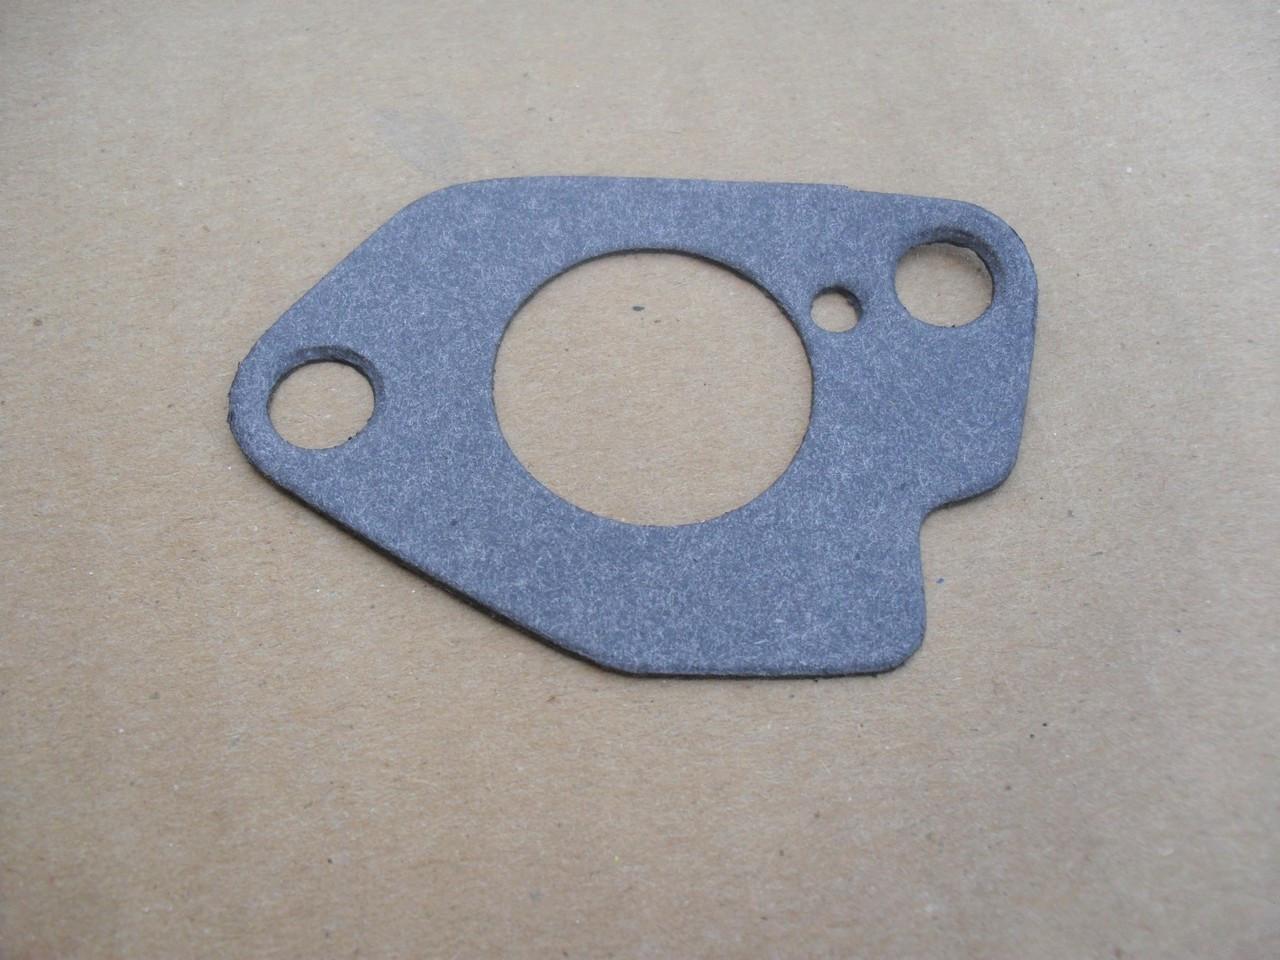 Carburetor Gasket for Honda GX340, GXV340, 16221ZE3000, 16221ZE3306, 16221ZE3800, 16221-ZE3-000, 16221-ZE3-306, 16221-ZE3-800